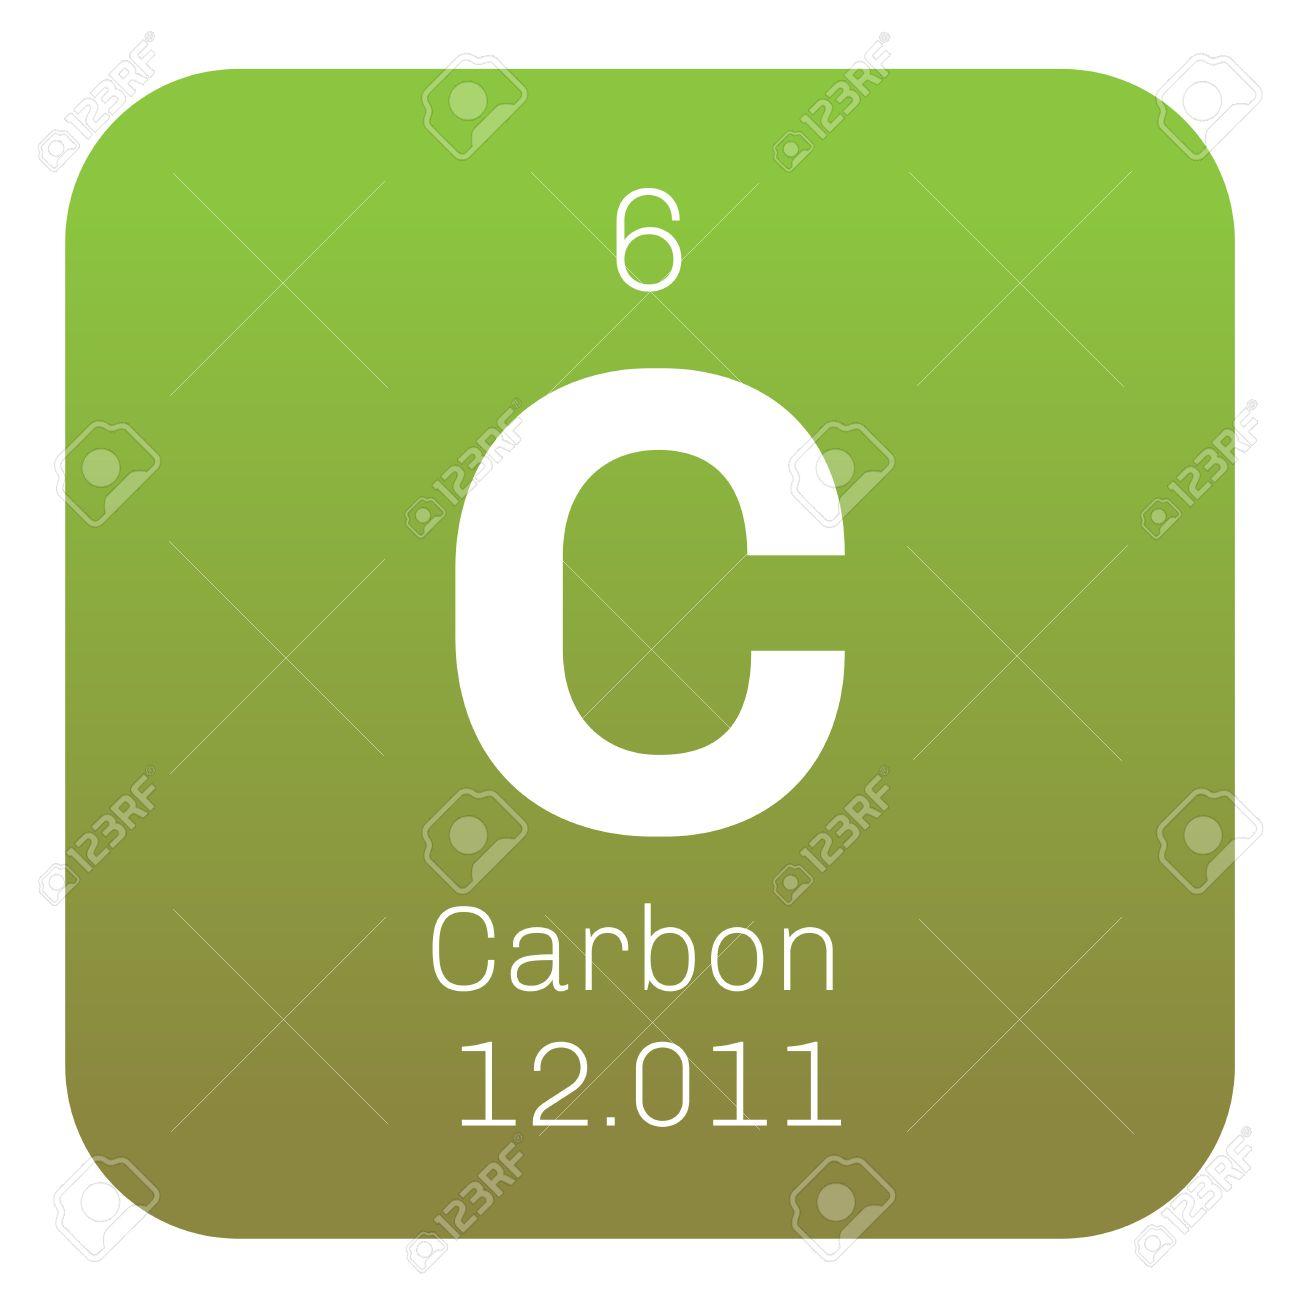 Carbon chemical element graphite and diamond colored icon with carbon chemical element graphite and diamond colored icon with atomic number and atomic weight buycottarizona